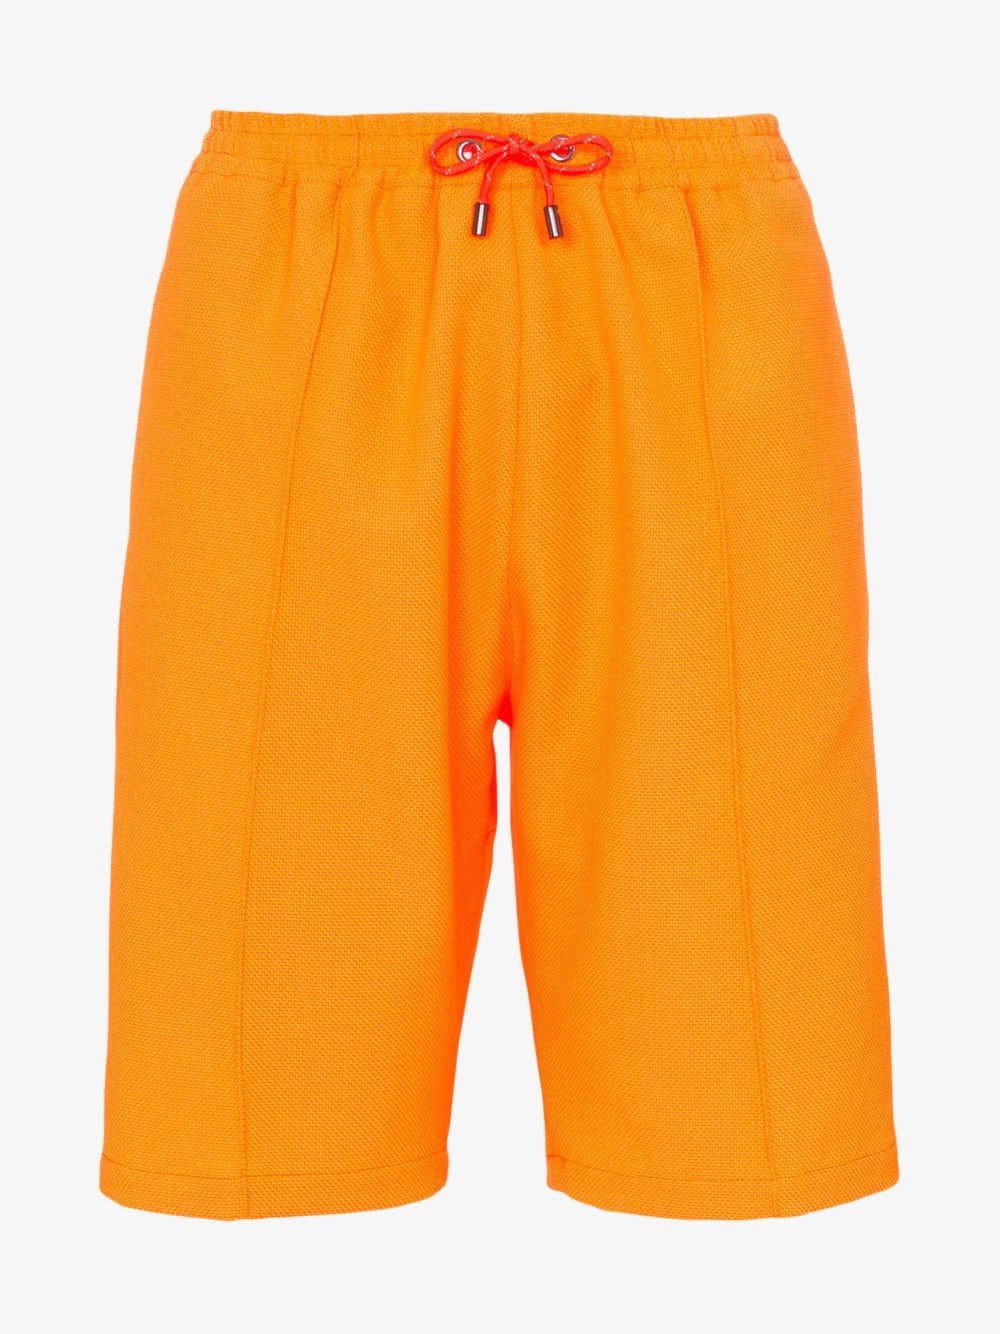 HOUSE OF HOLLAND drawstring waist shorts in orange